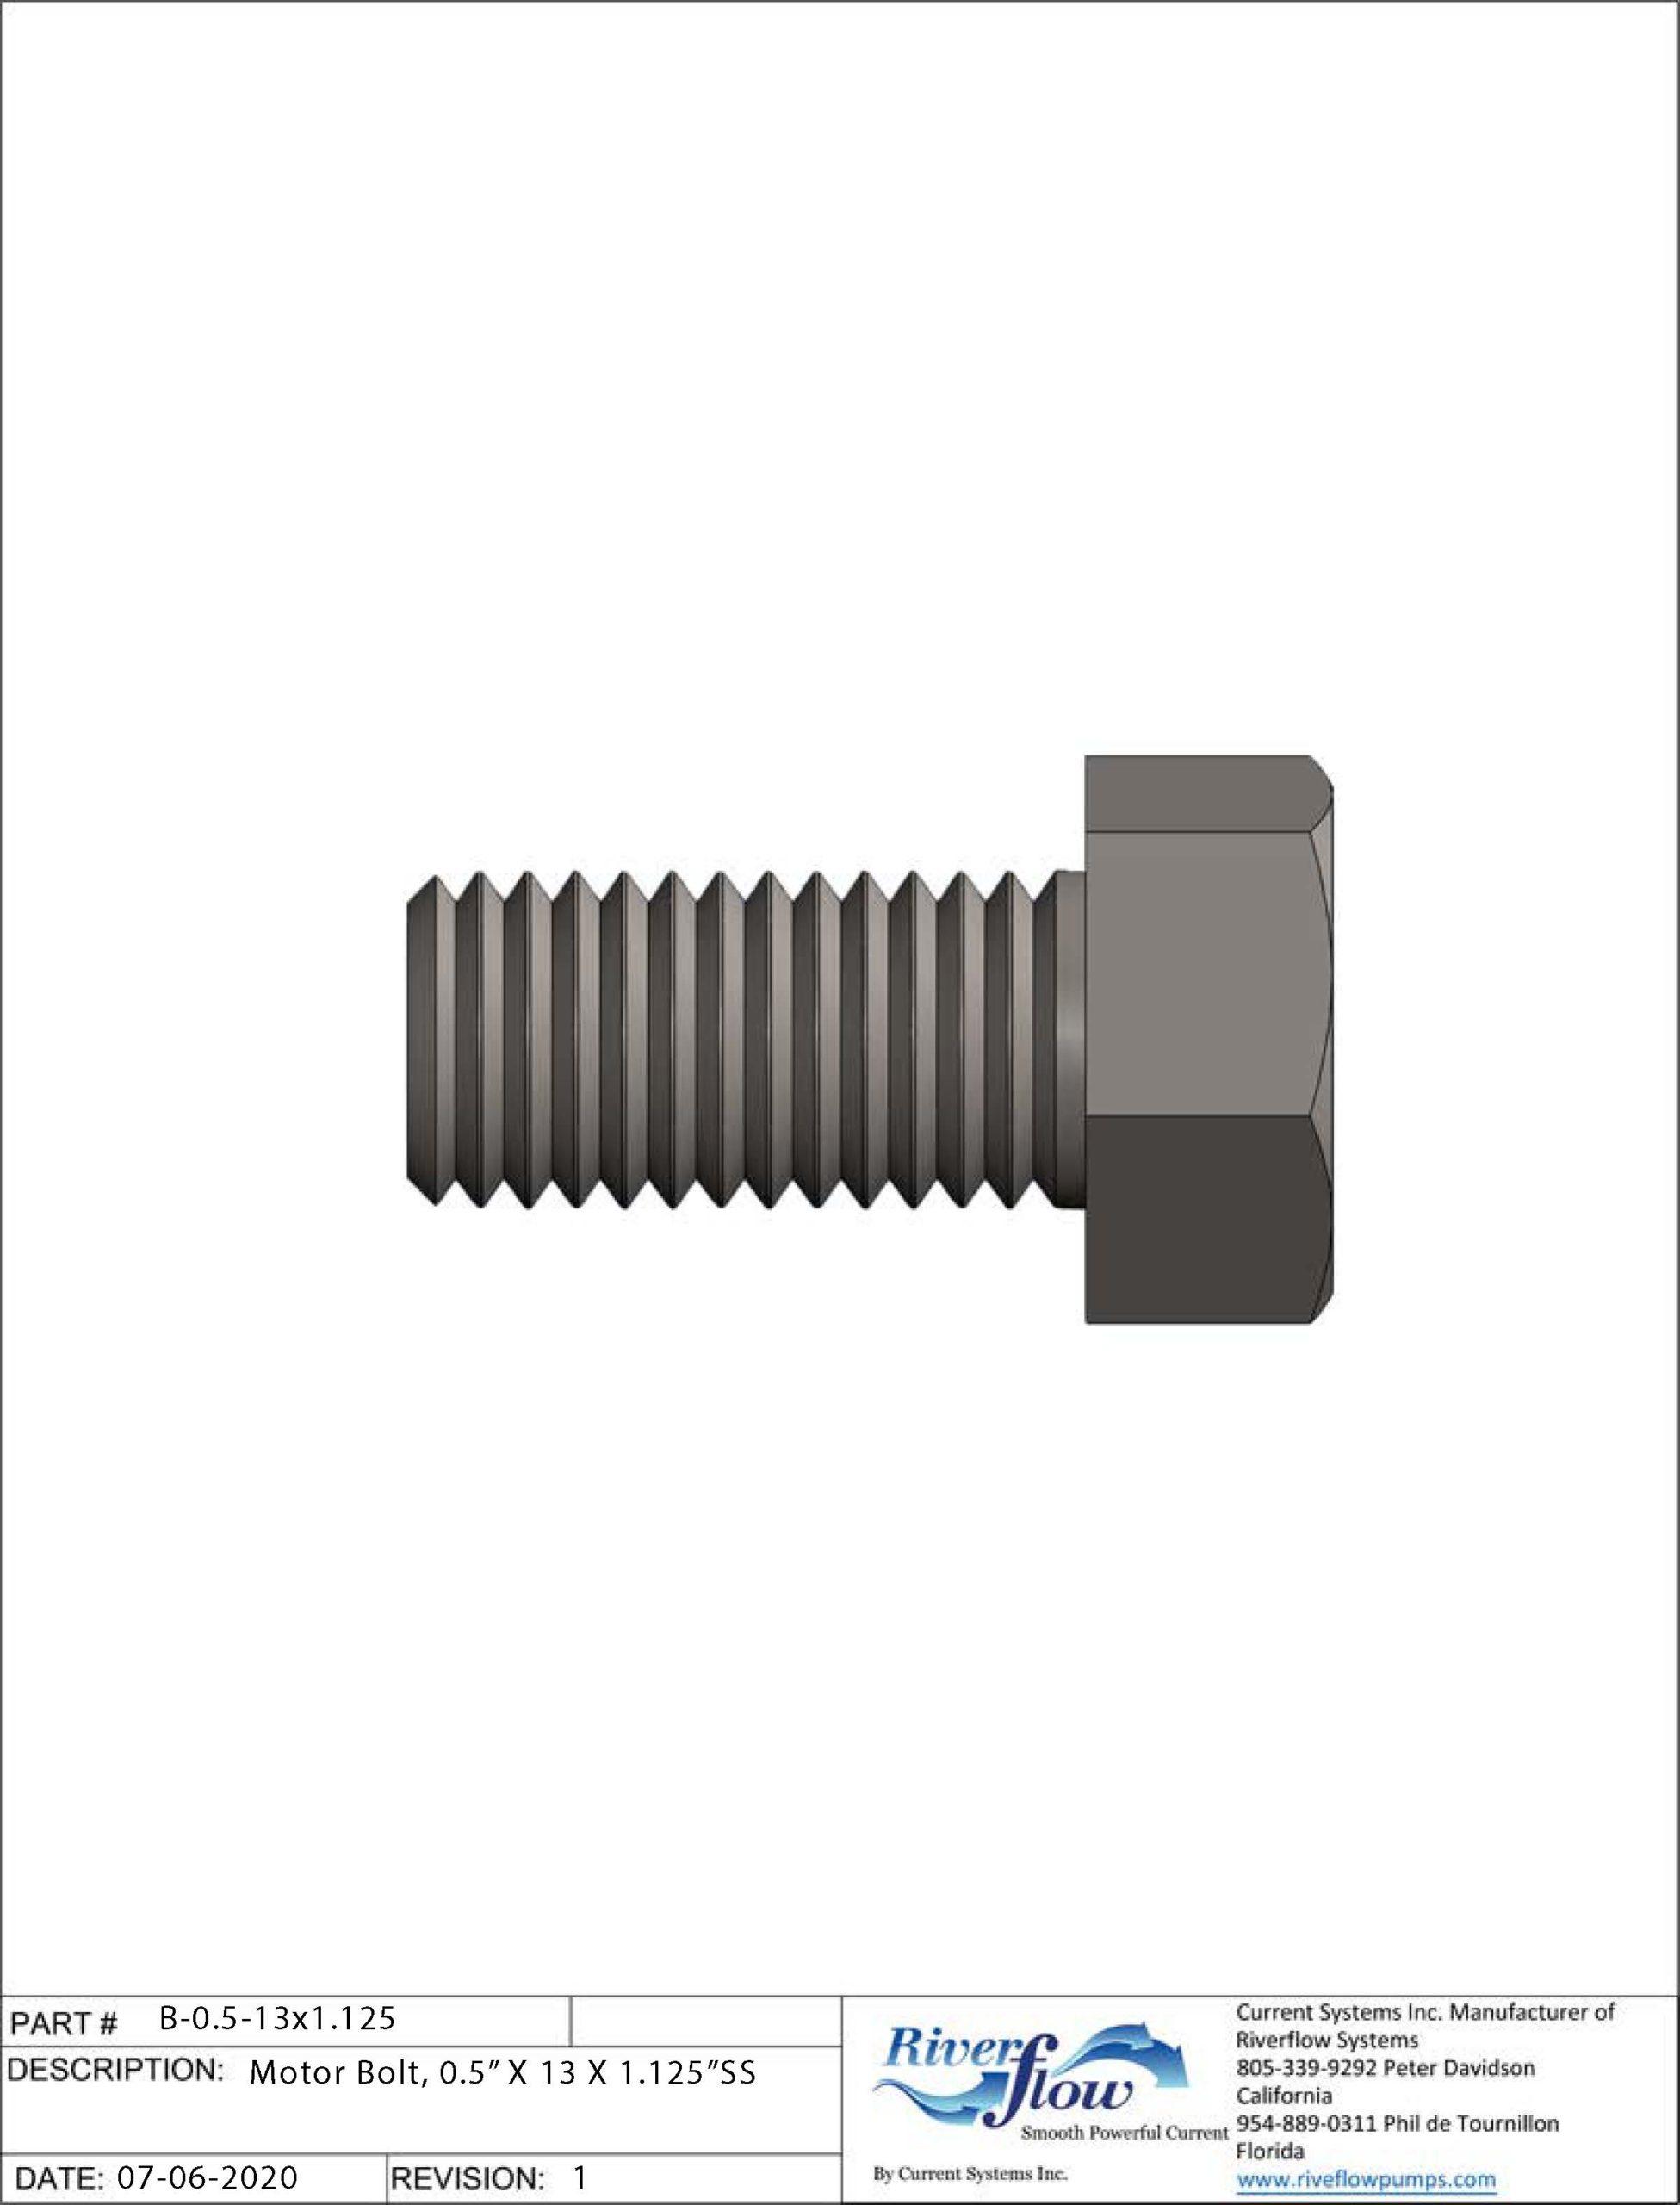 PN#: B-0.5-13x1.125 Motor Bolt, 0.5